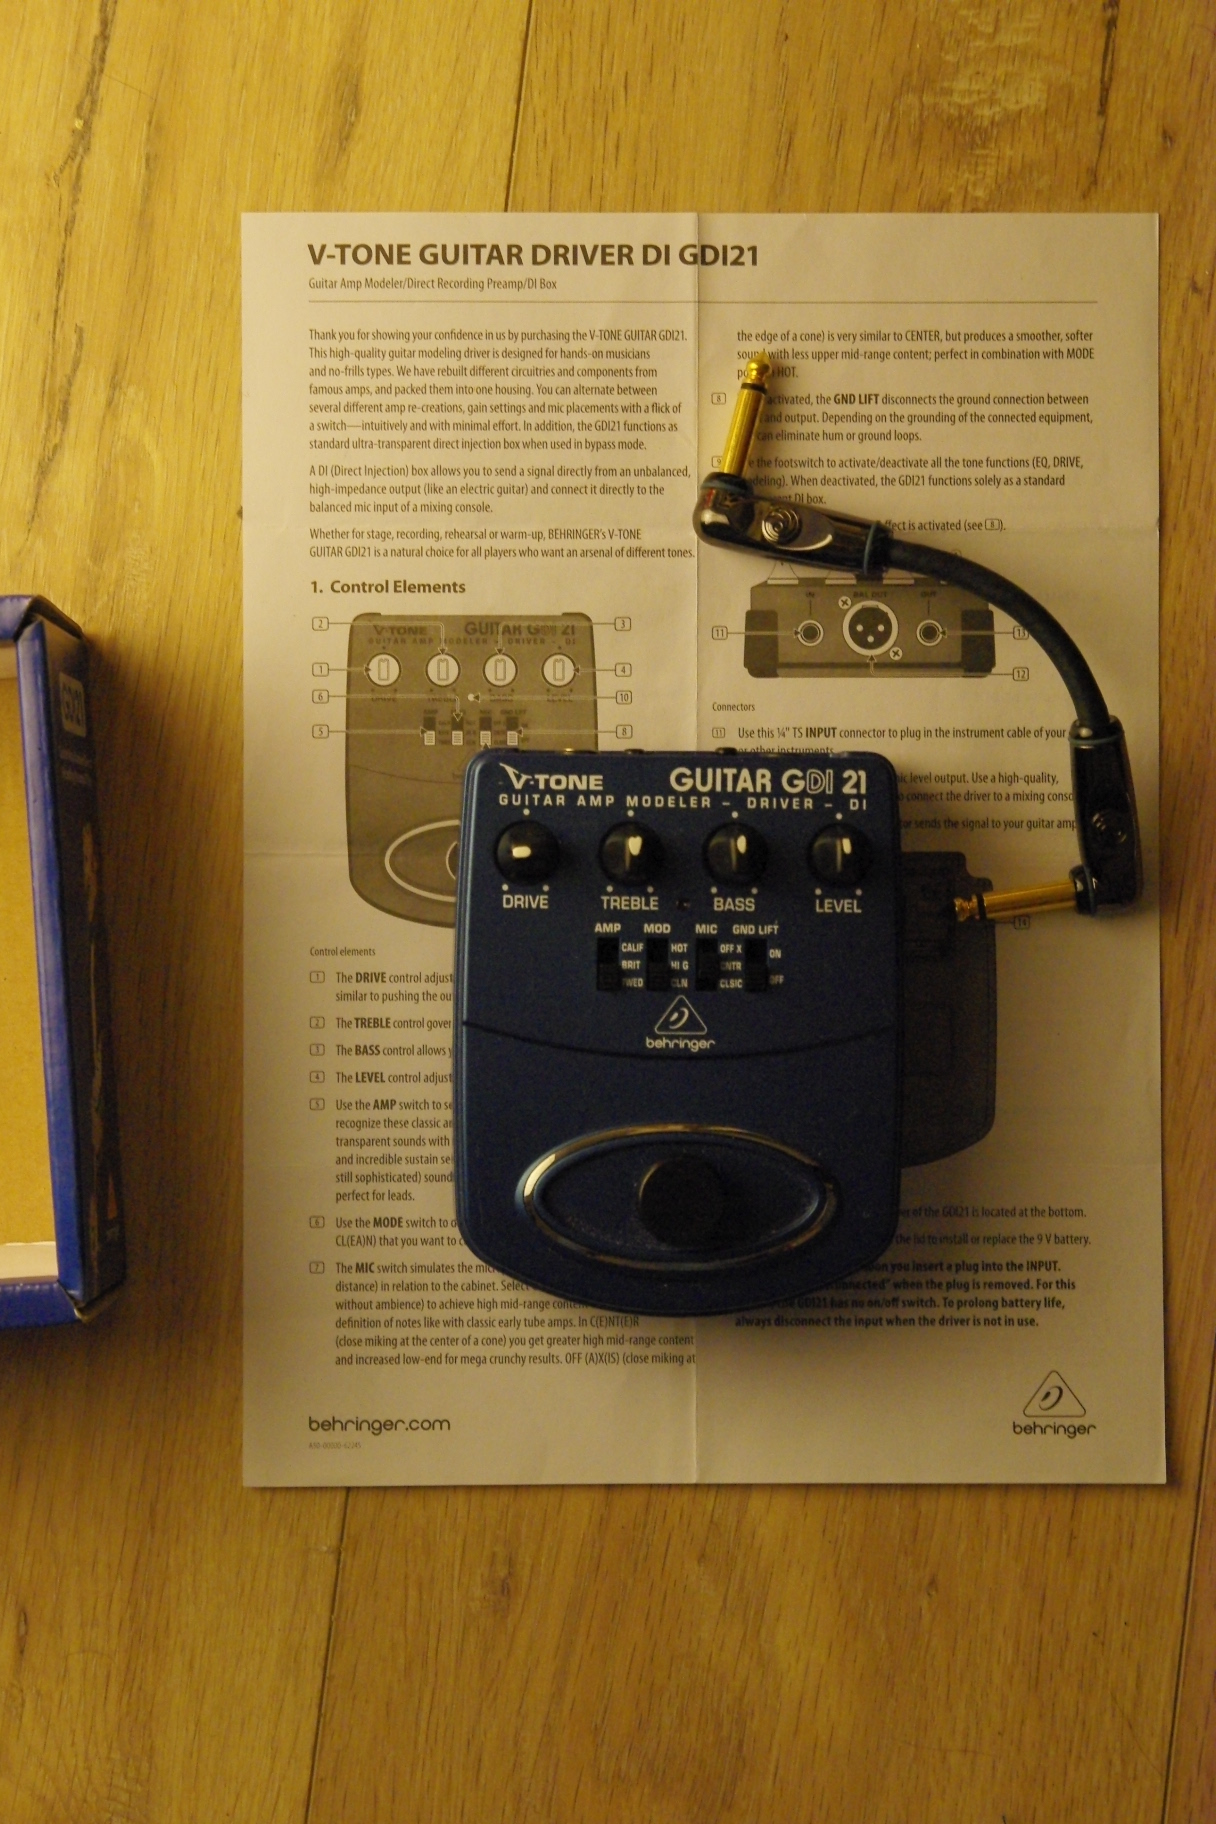 behringer v tone gmx212 manual